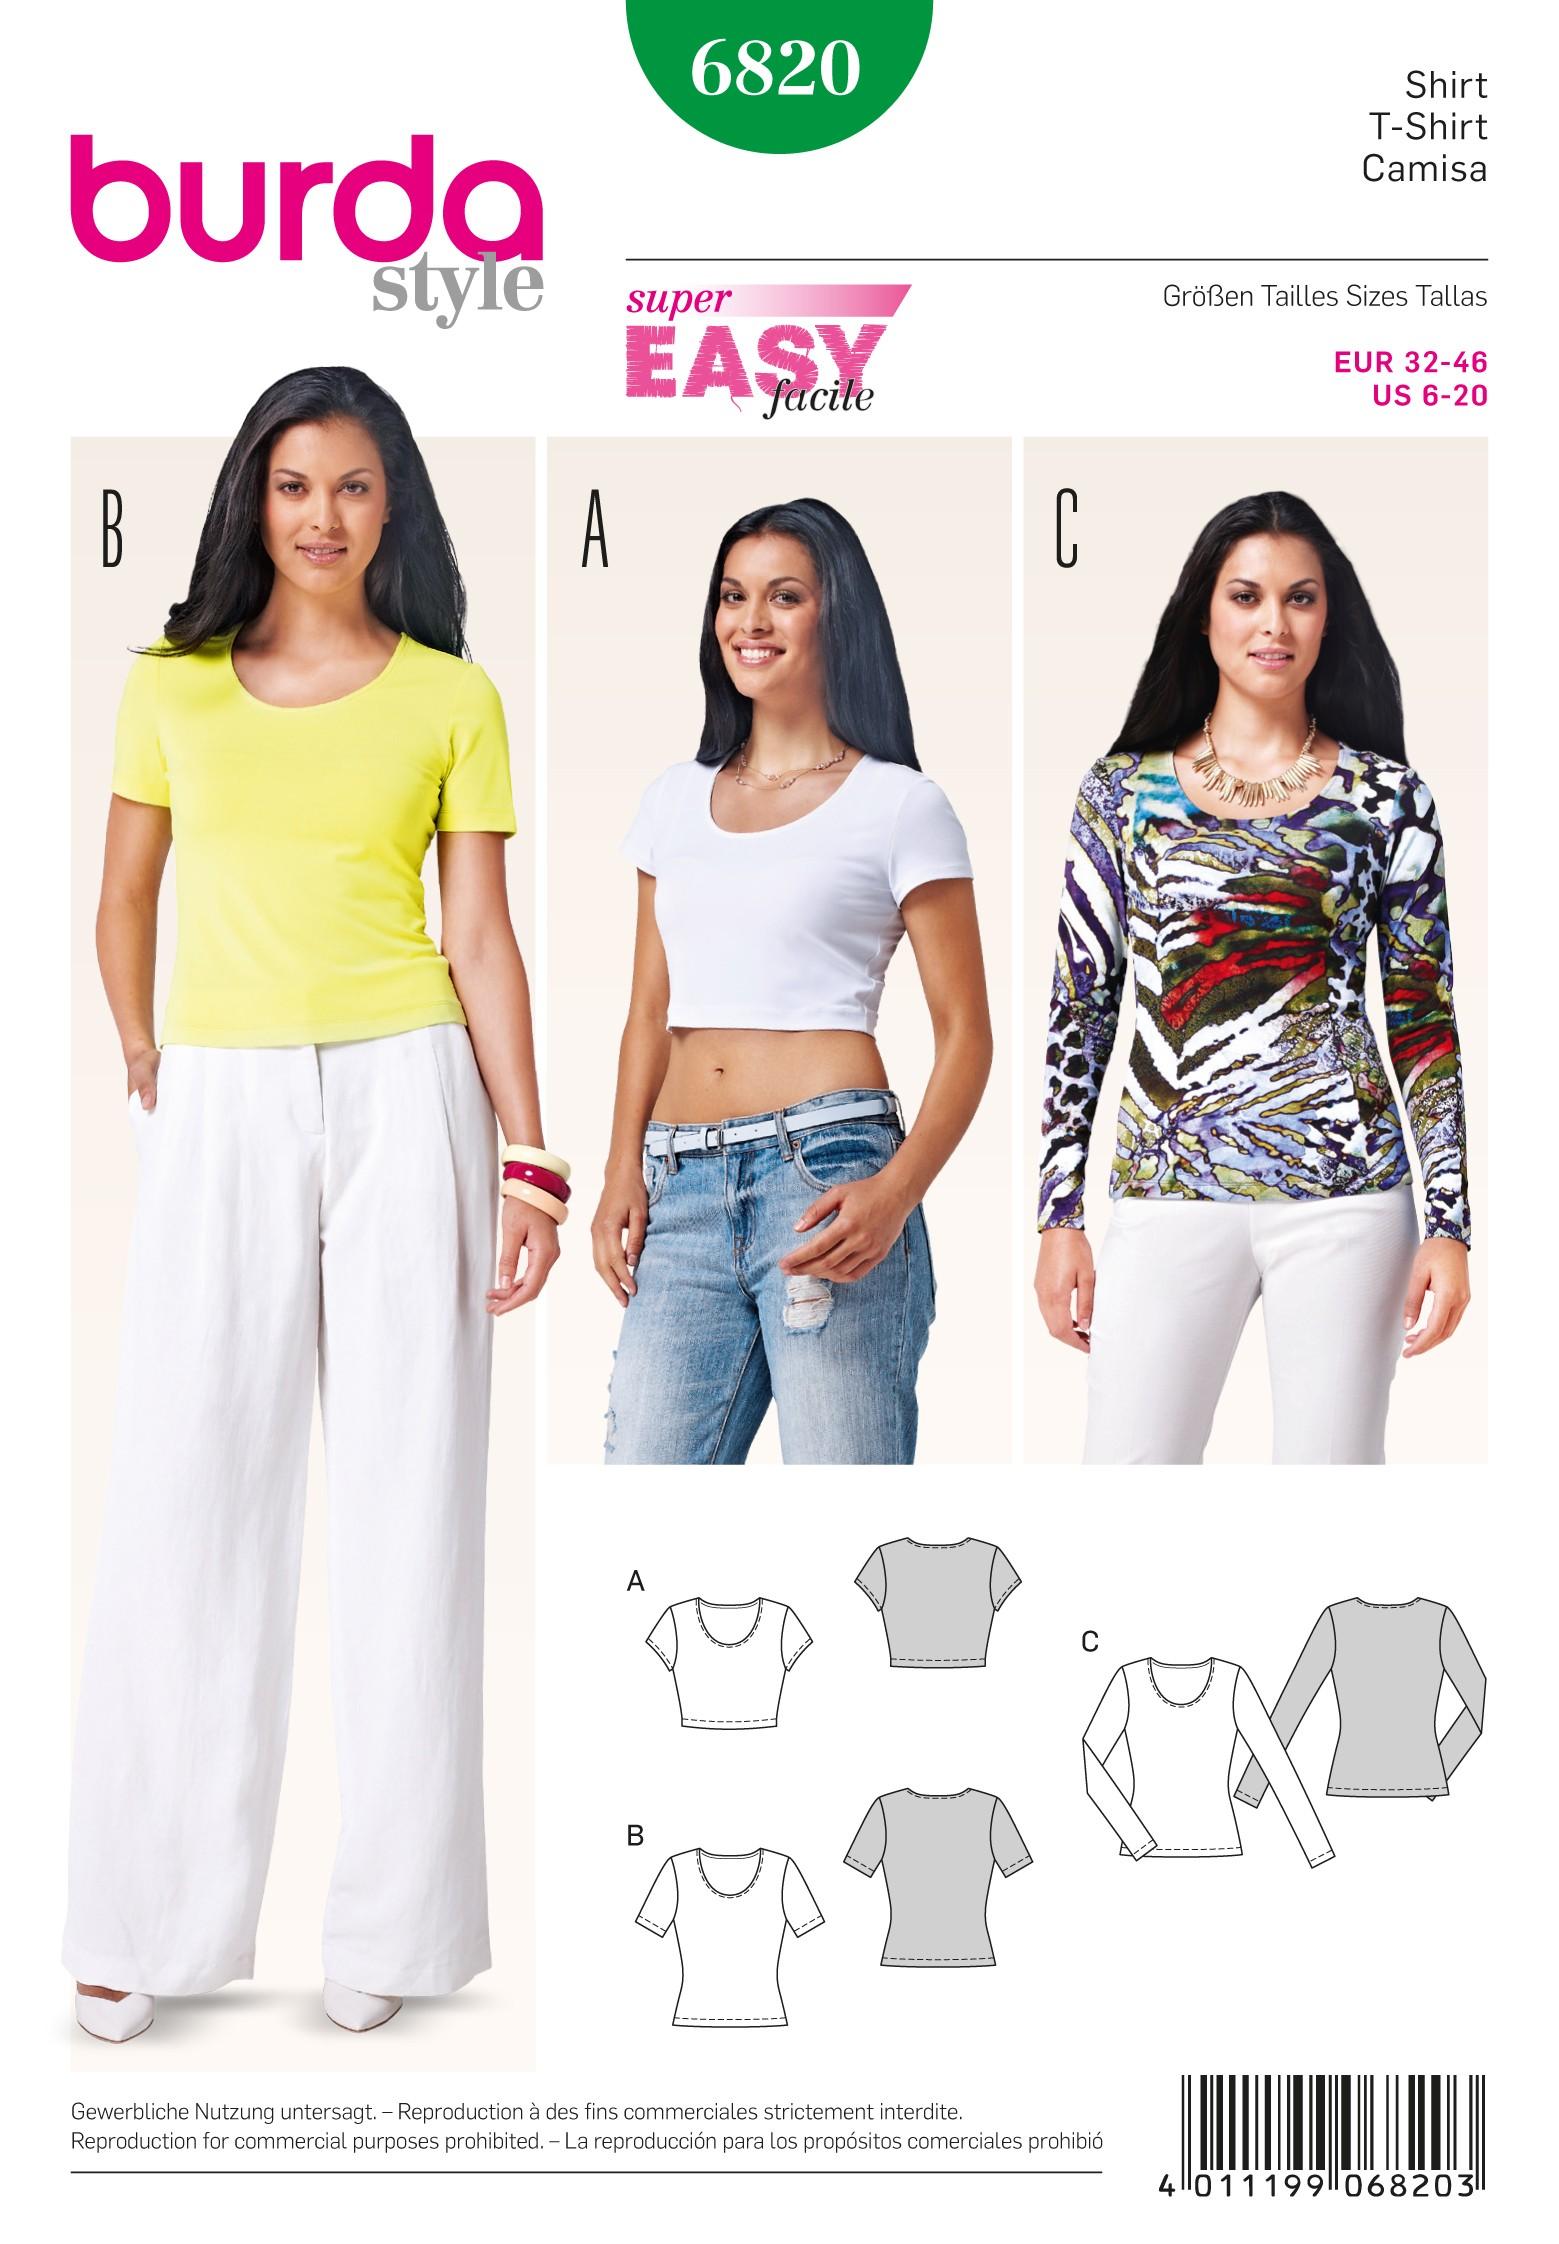 Burda Style Misses' Stylish Basic T-Shirt for Summer Sewing Pattern 6820